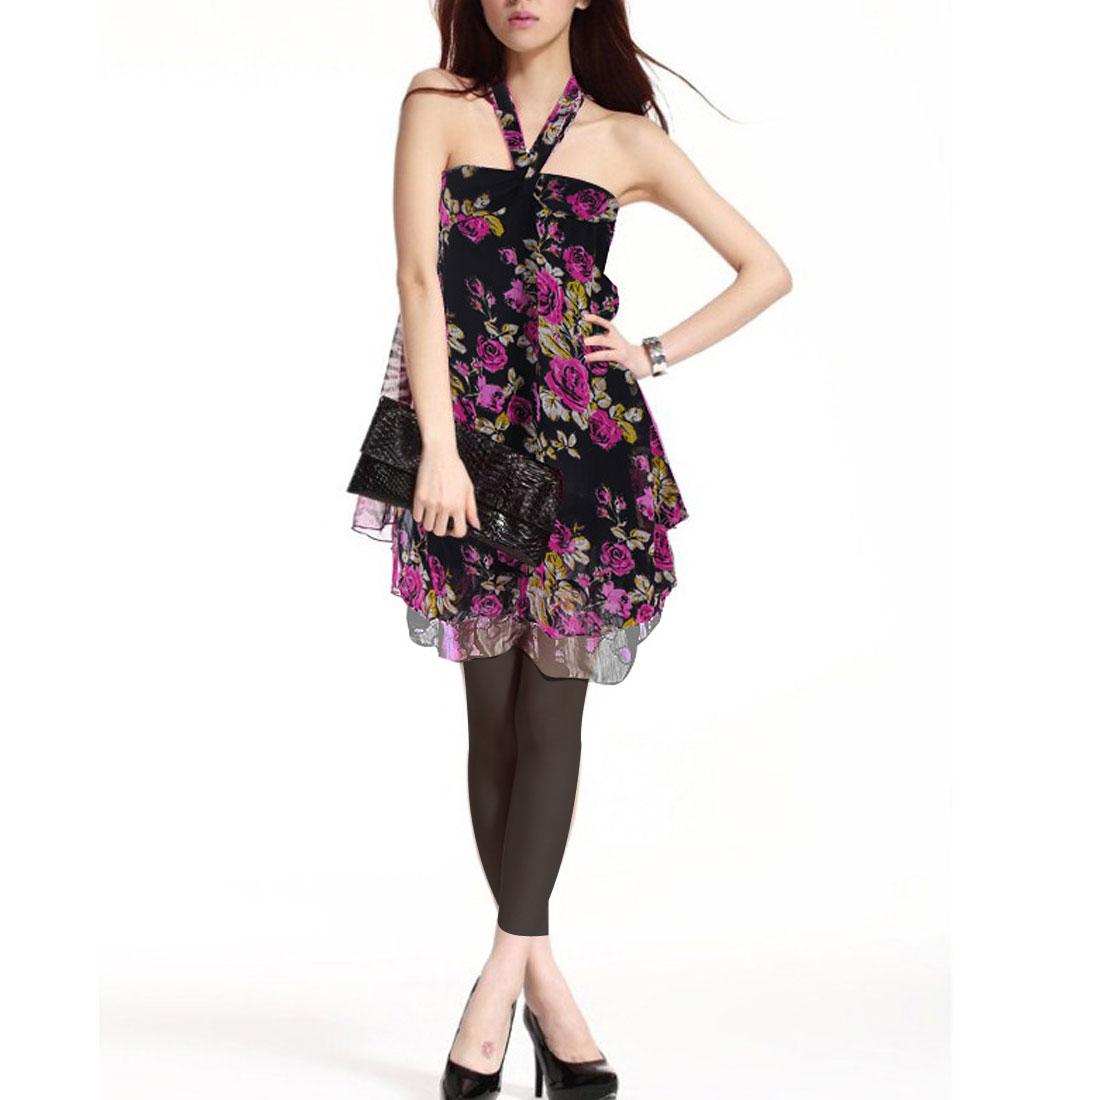 Ladies Black Fuchsia Flowers Pattern Stylish Halter Blouse XS